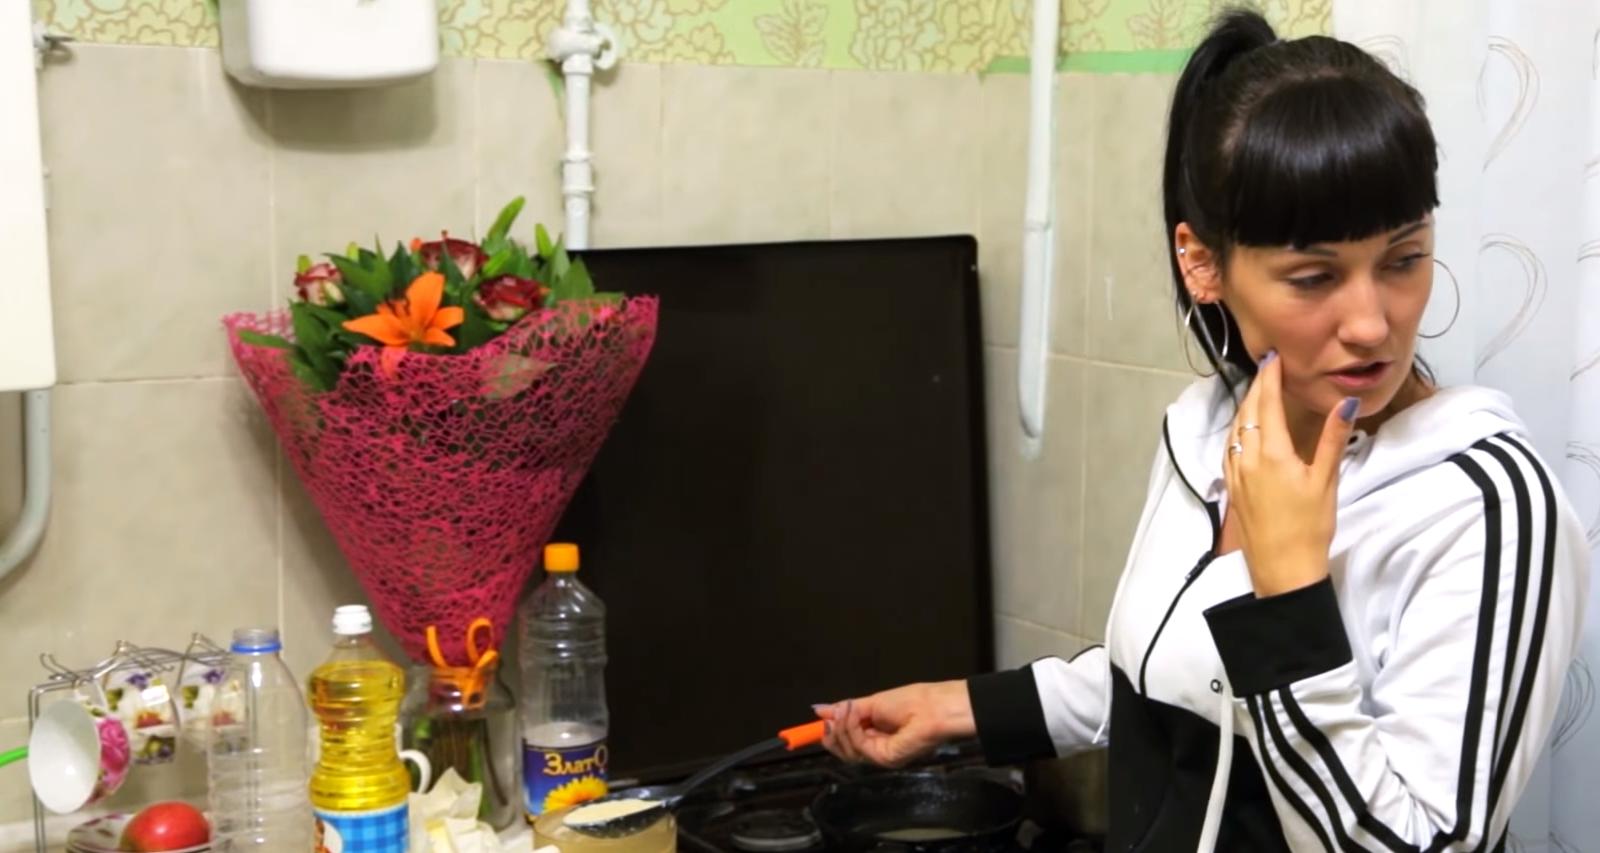 Семейная пара из Запорожской области стала героями шоу «Міняю жінку» - ФОТО, ВИДЕО